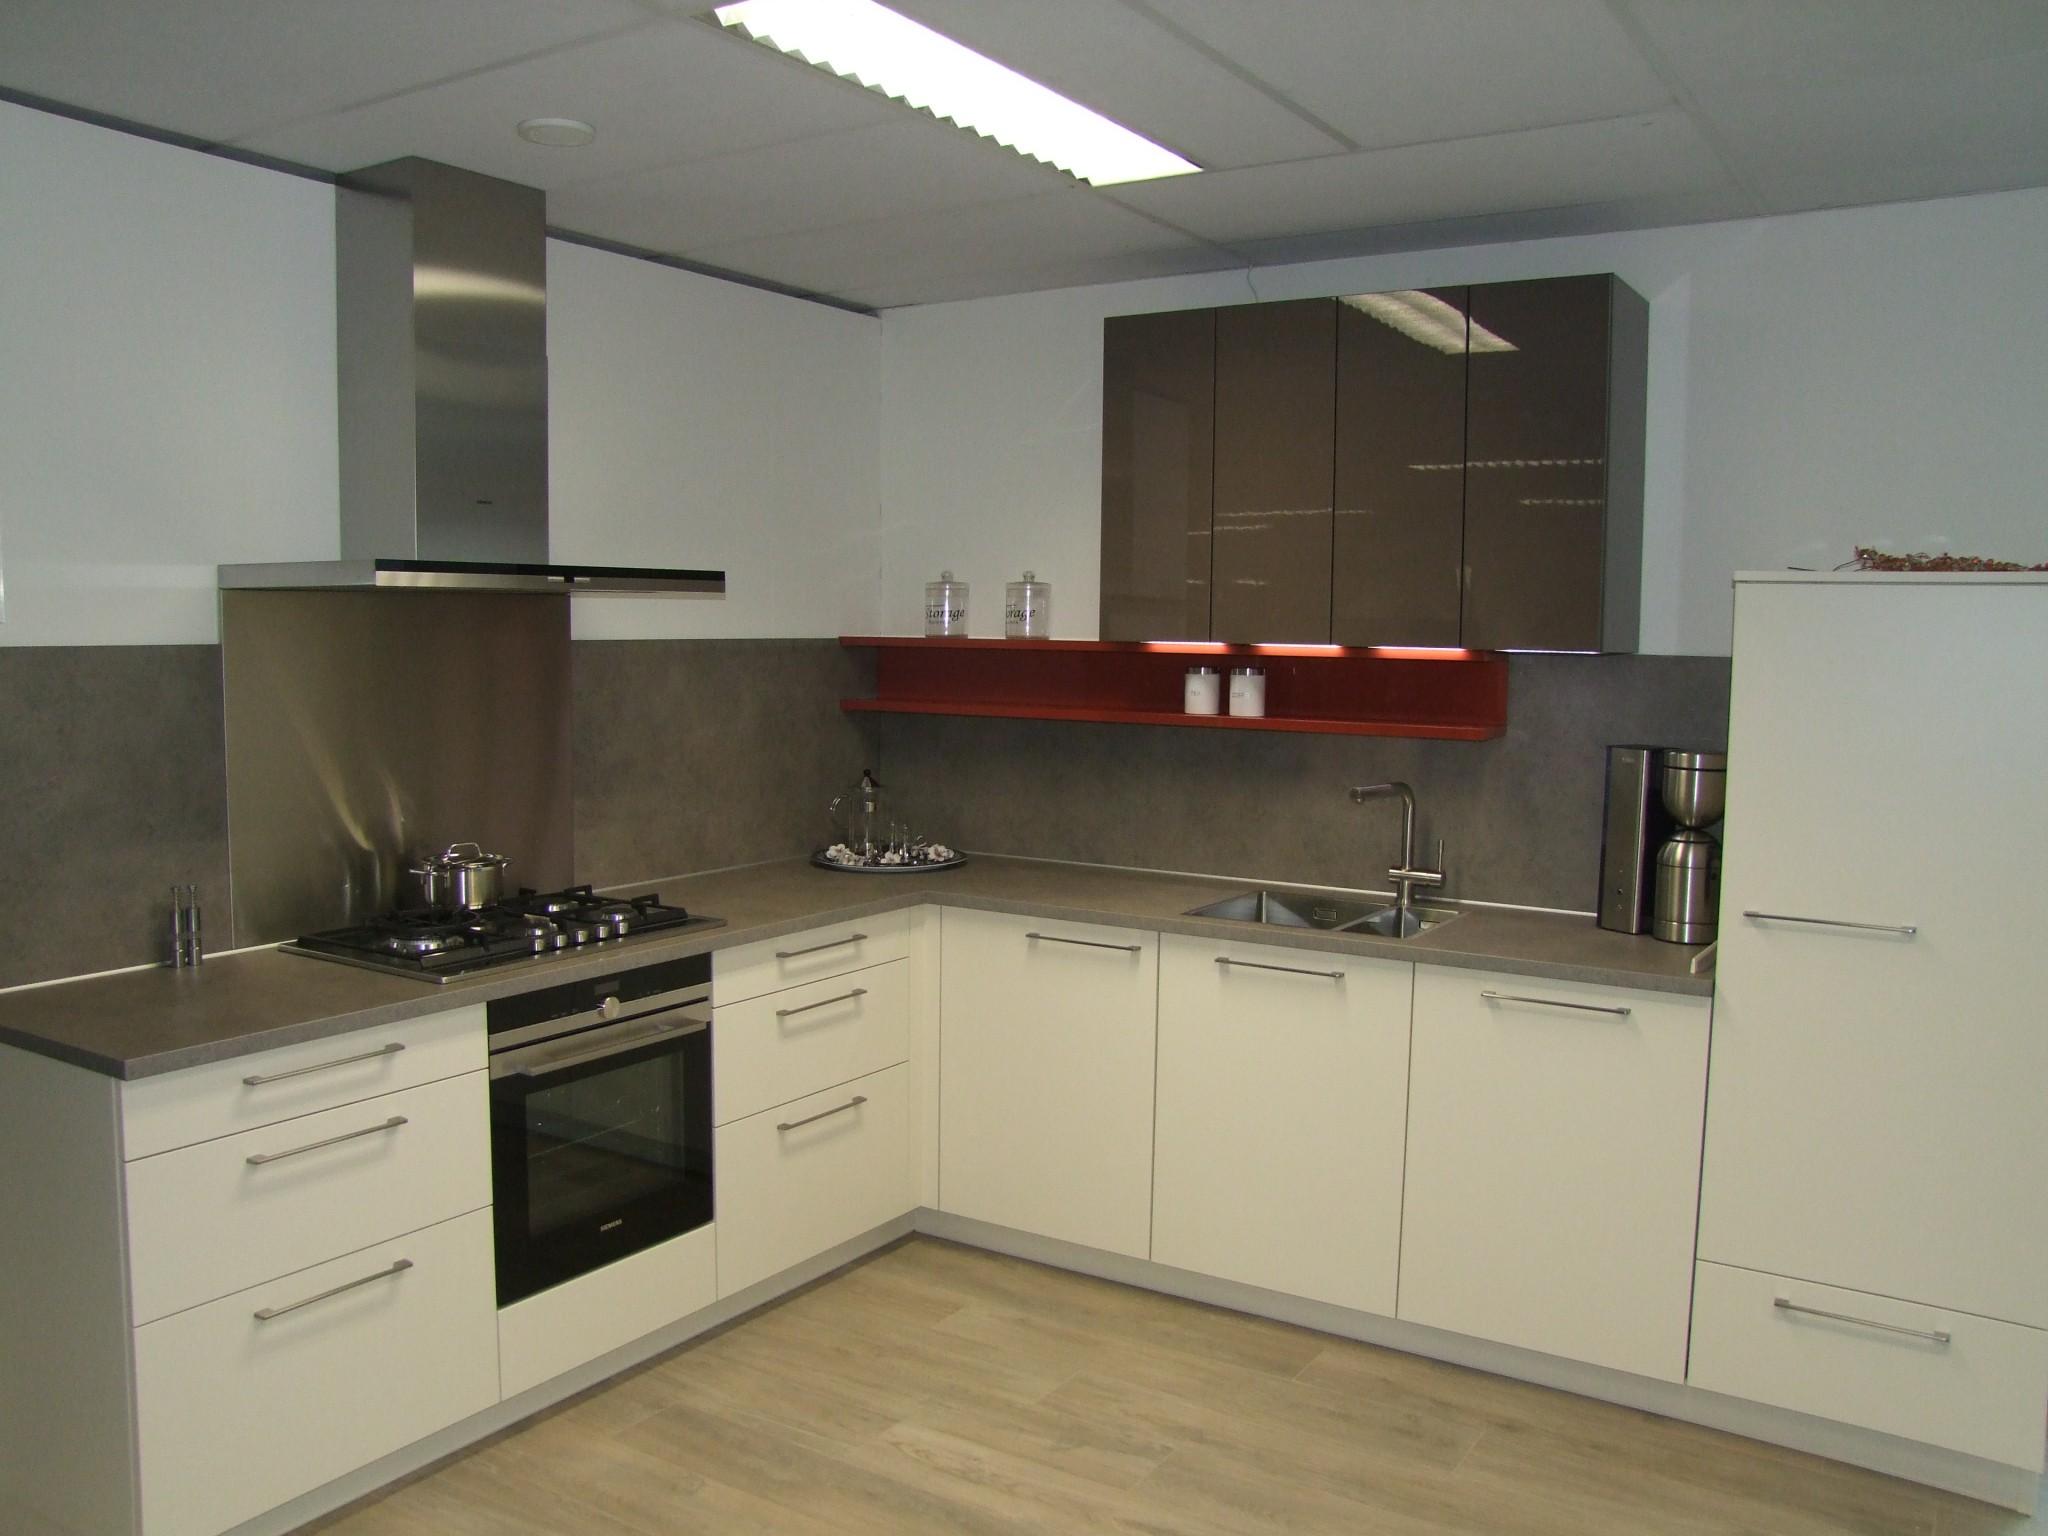 Moderne Tijdloze Keuken : Moderne tijdloze vancel keuken kremer keukens showroom opruiming